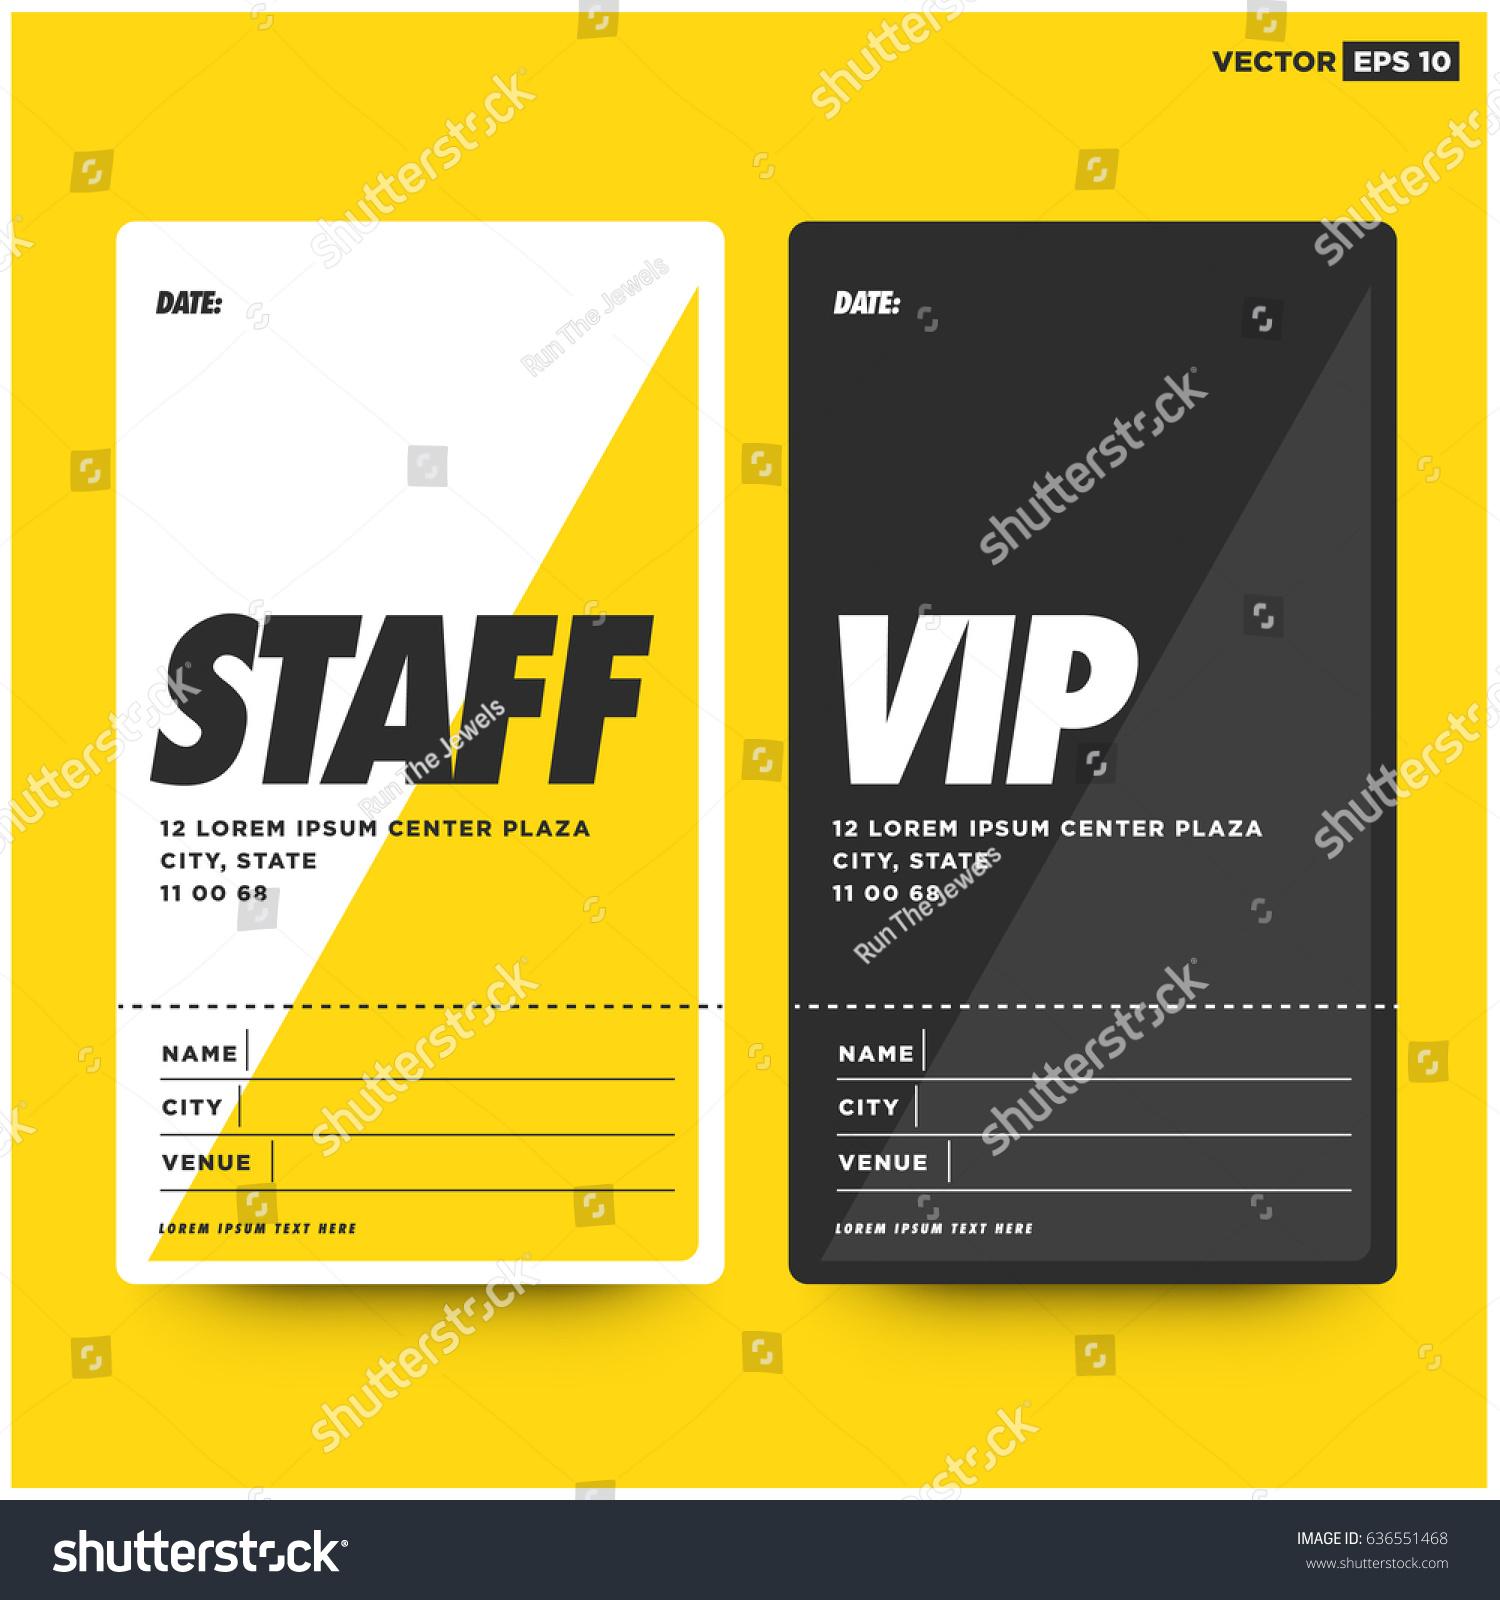 Staff VIP Entry ID Card Design Vector de stock636551468: Shutterstock